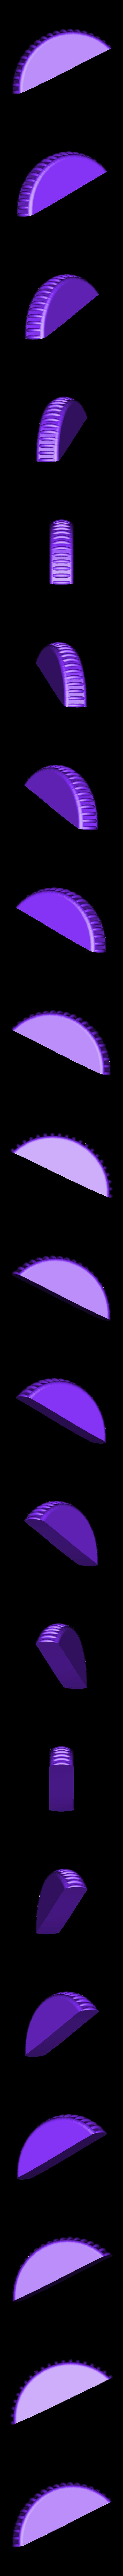 V2_mouse_wheel.STL Download free STL file Multi-Color Computer Mouse Model: Industrial/Product Design • 3D printable model, MosaicManufacturing